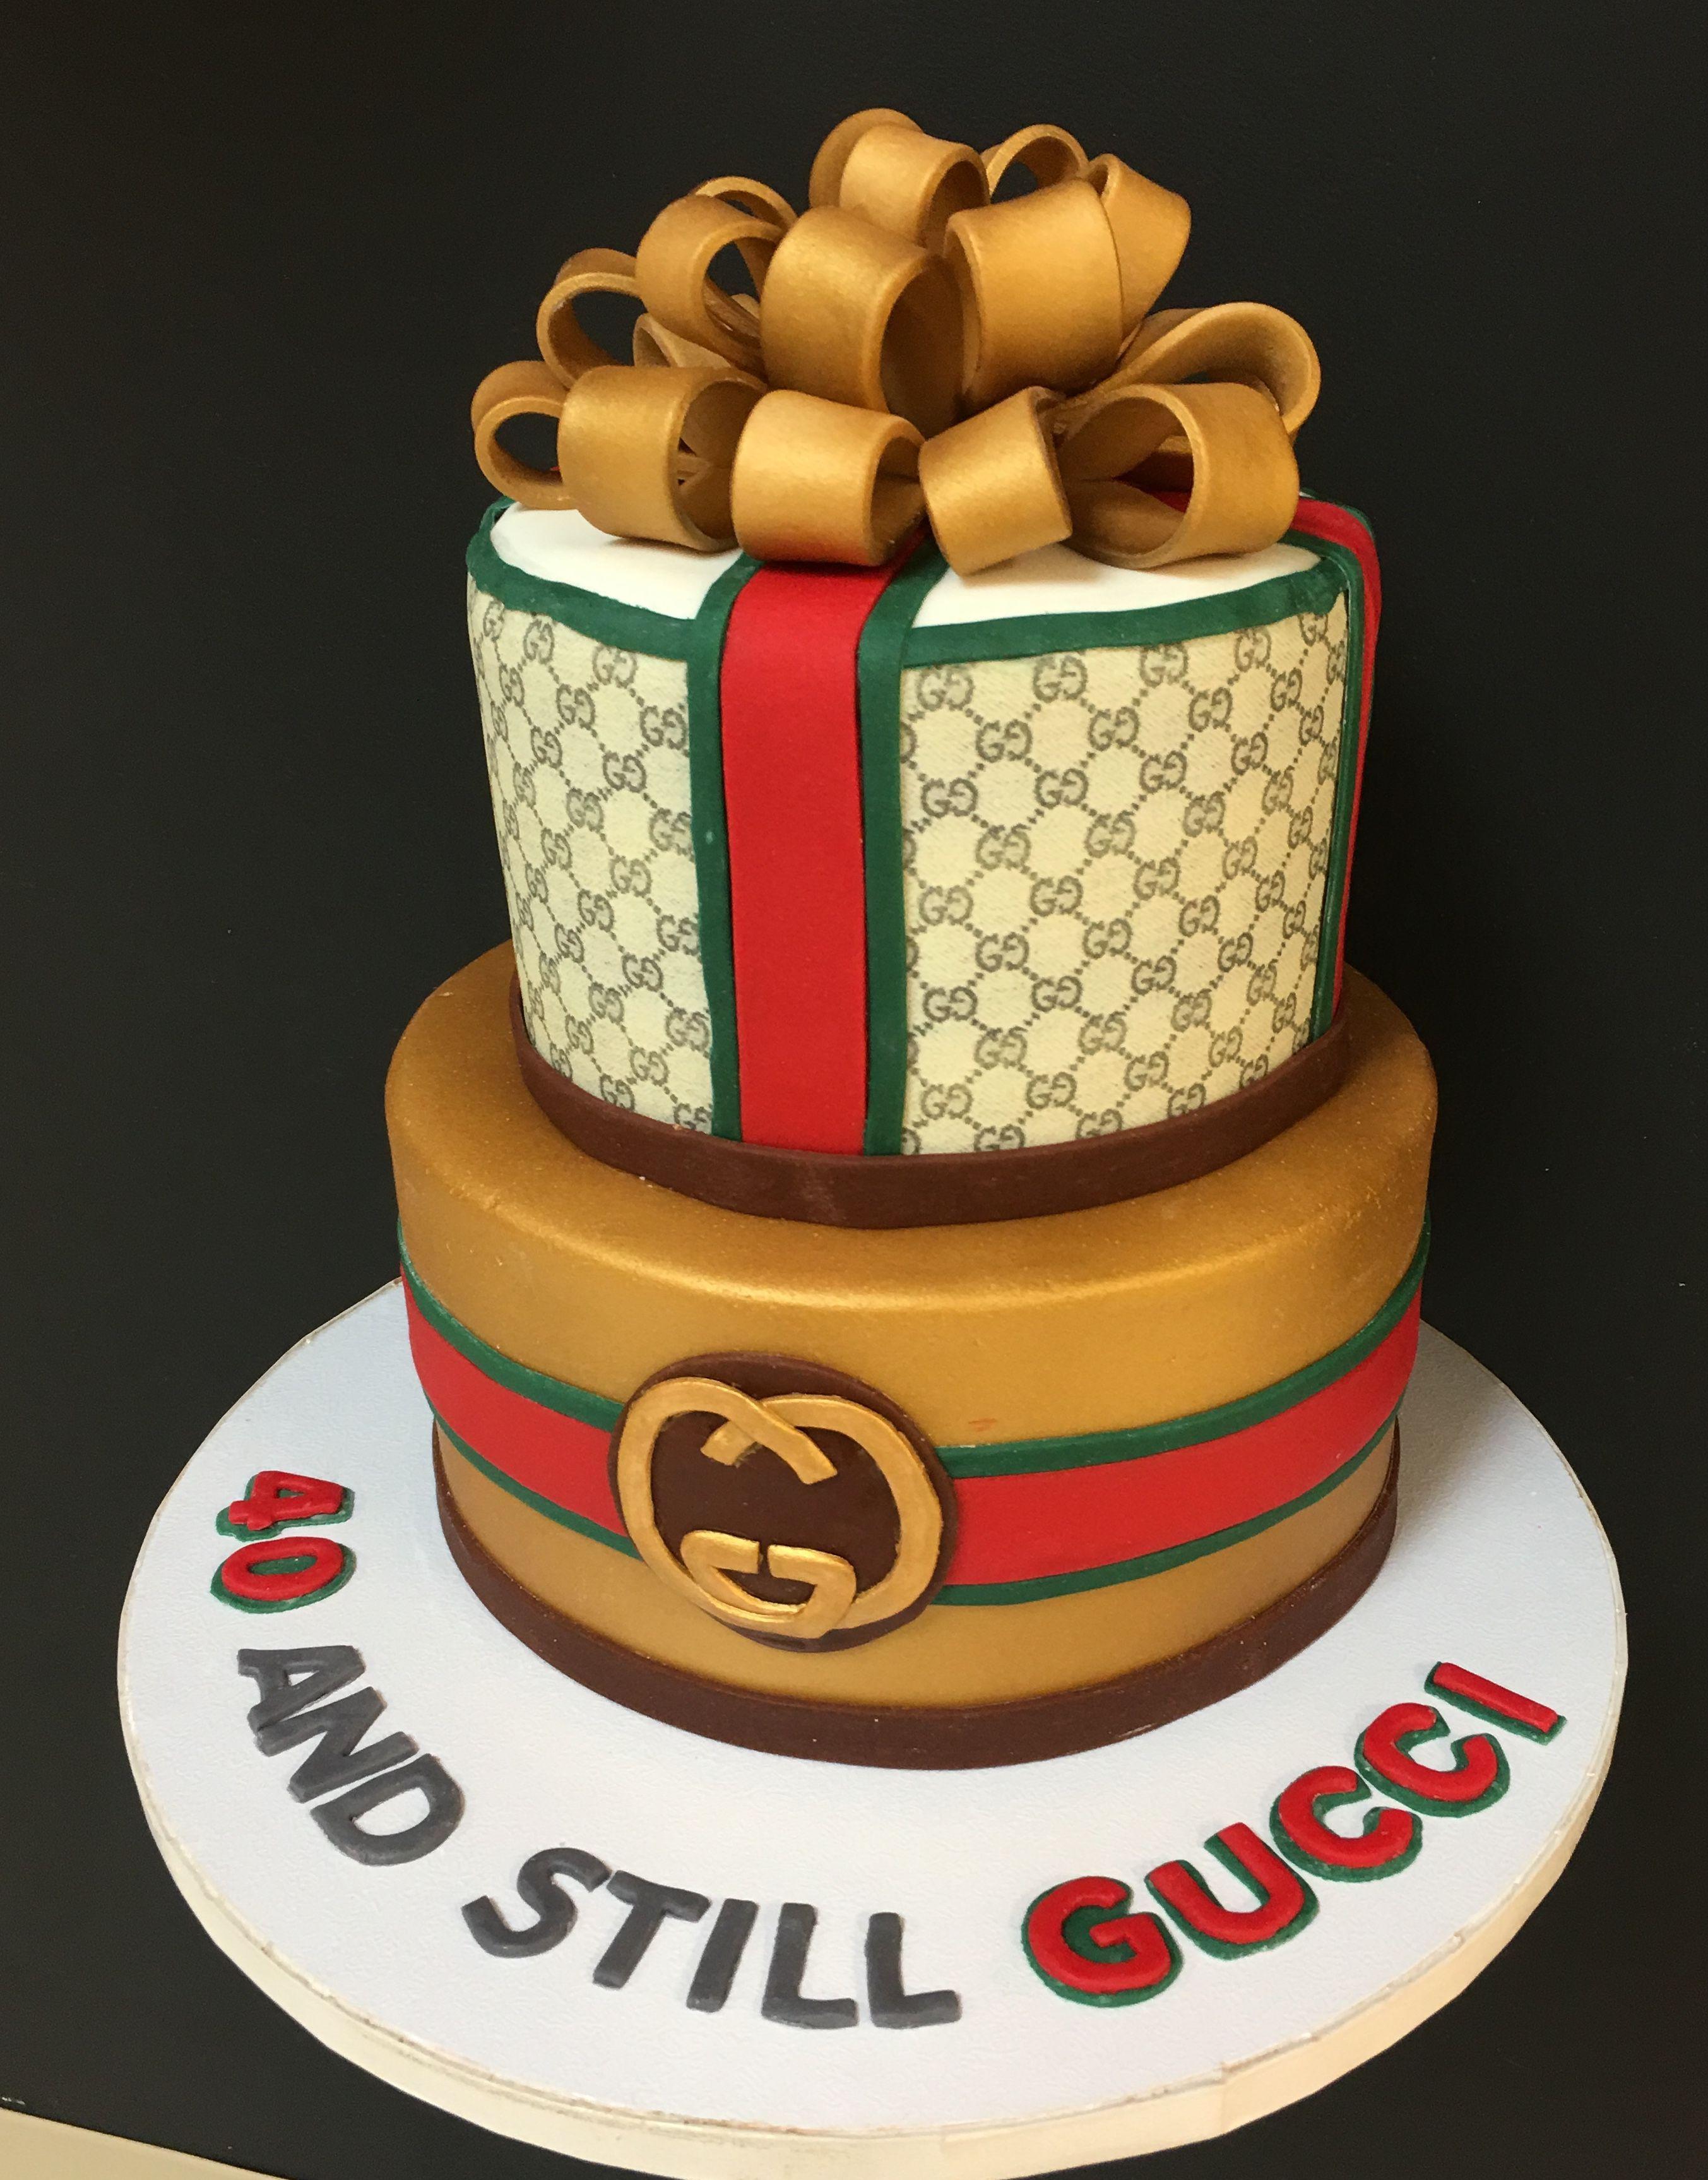 40 And Still Gucci Cake Birthday Designer Cake Fondant Cakes So Simple Cake Designs Birthday Fondant Cakes Cupcake Cakes